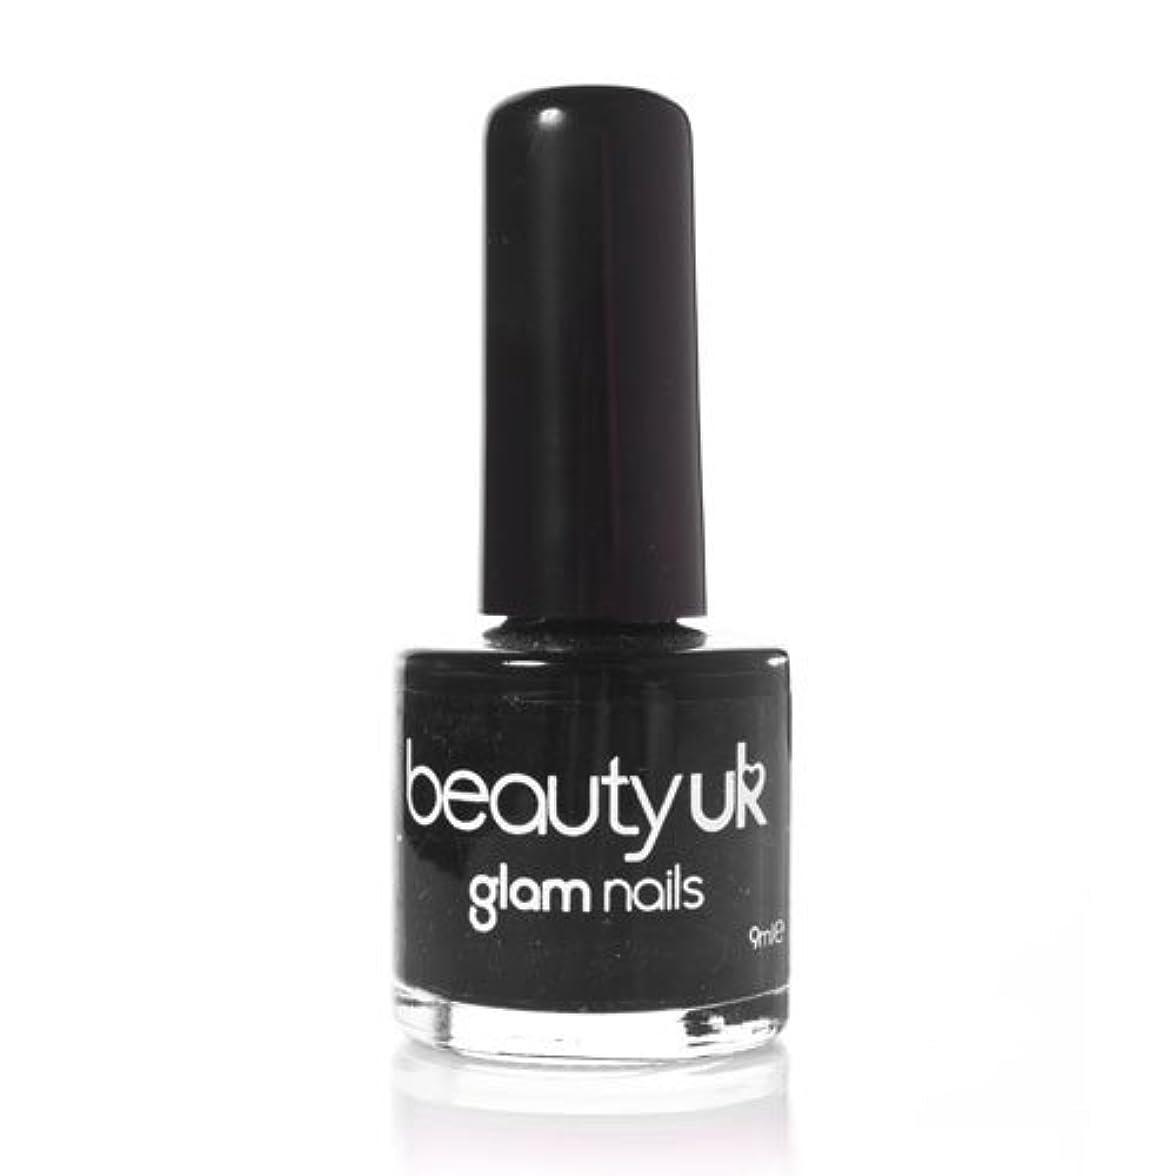 有罪繁殖乱闘Beauty Uk Glam Nails No6 Black 9ml [並行輸入品]